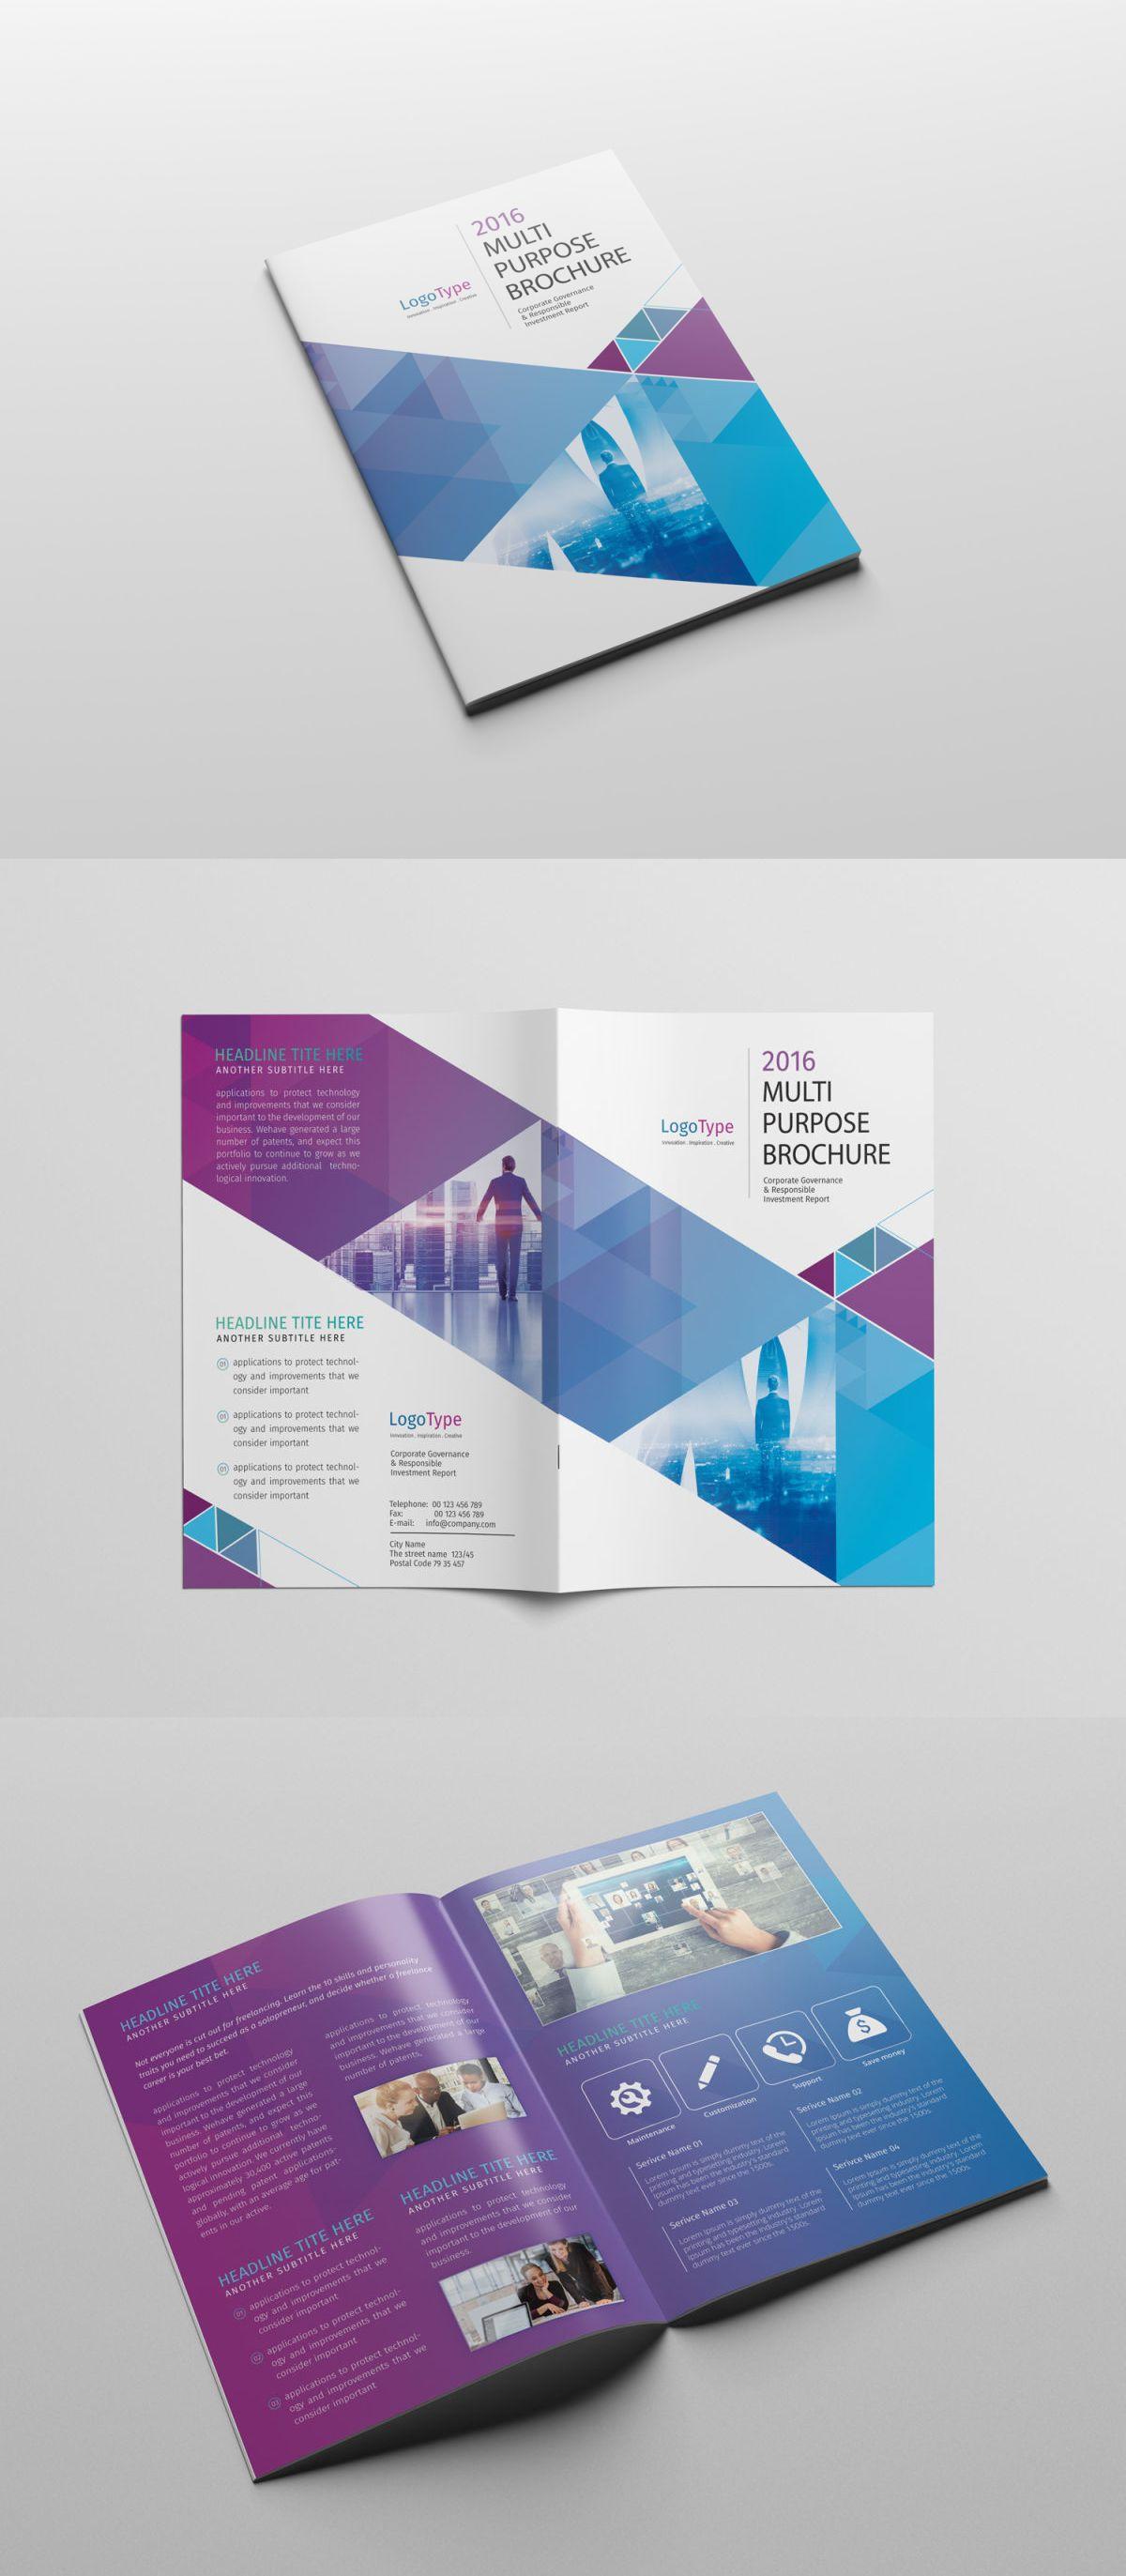 Abstract BiFold Brochure Template PSD Brochure Templates - Bi fold brochure template